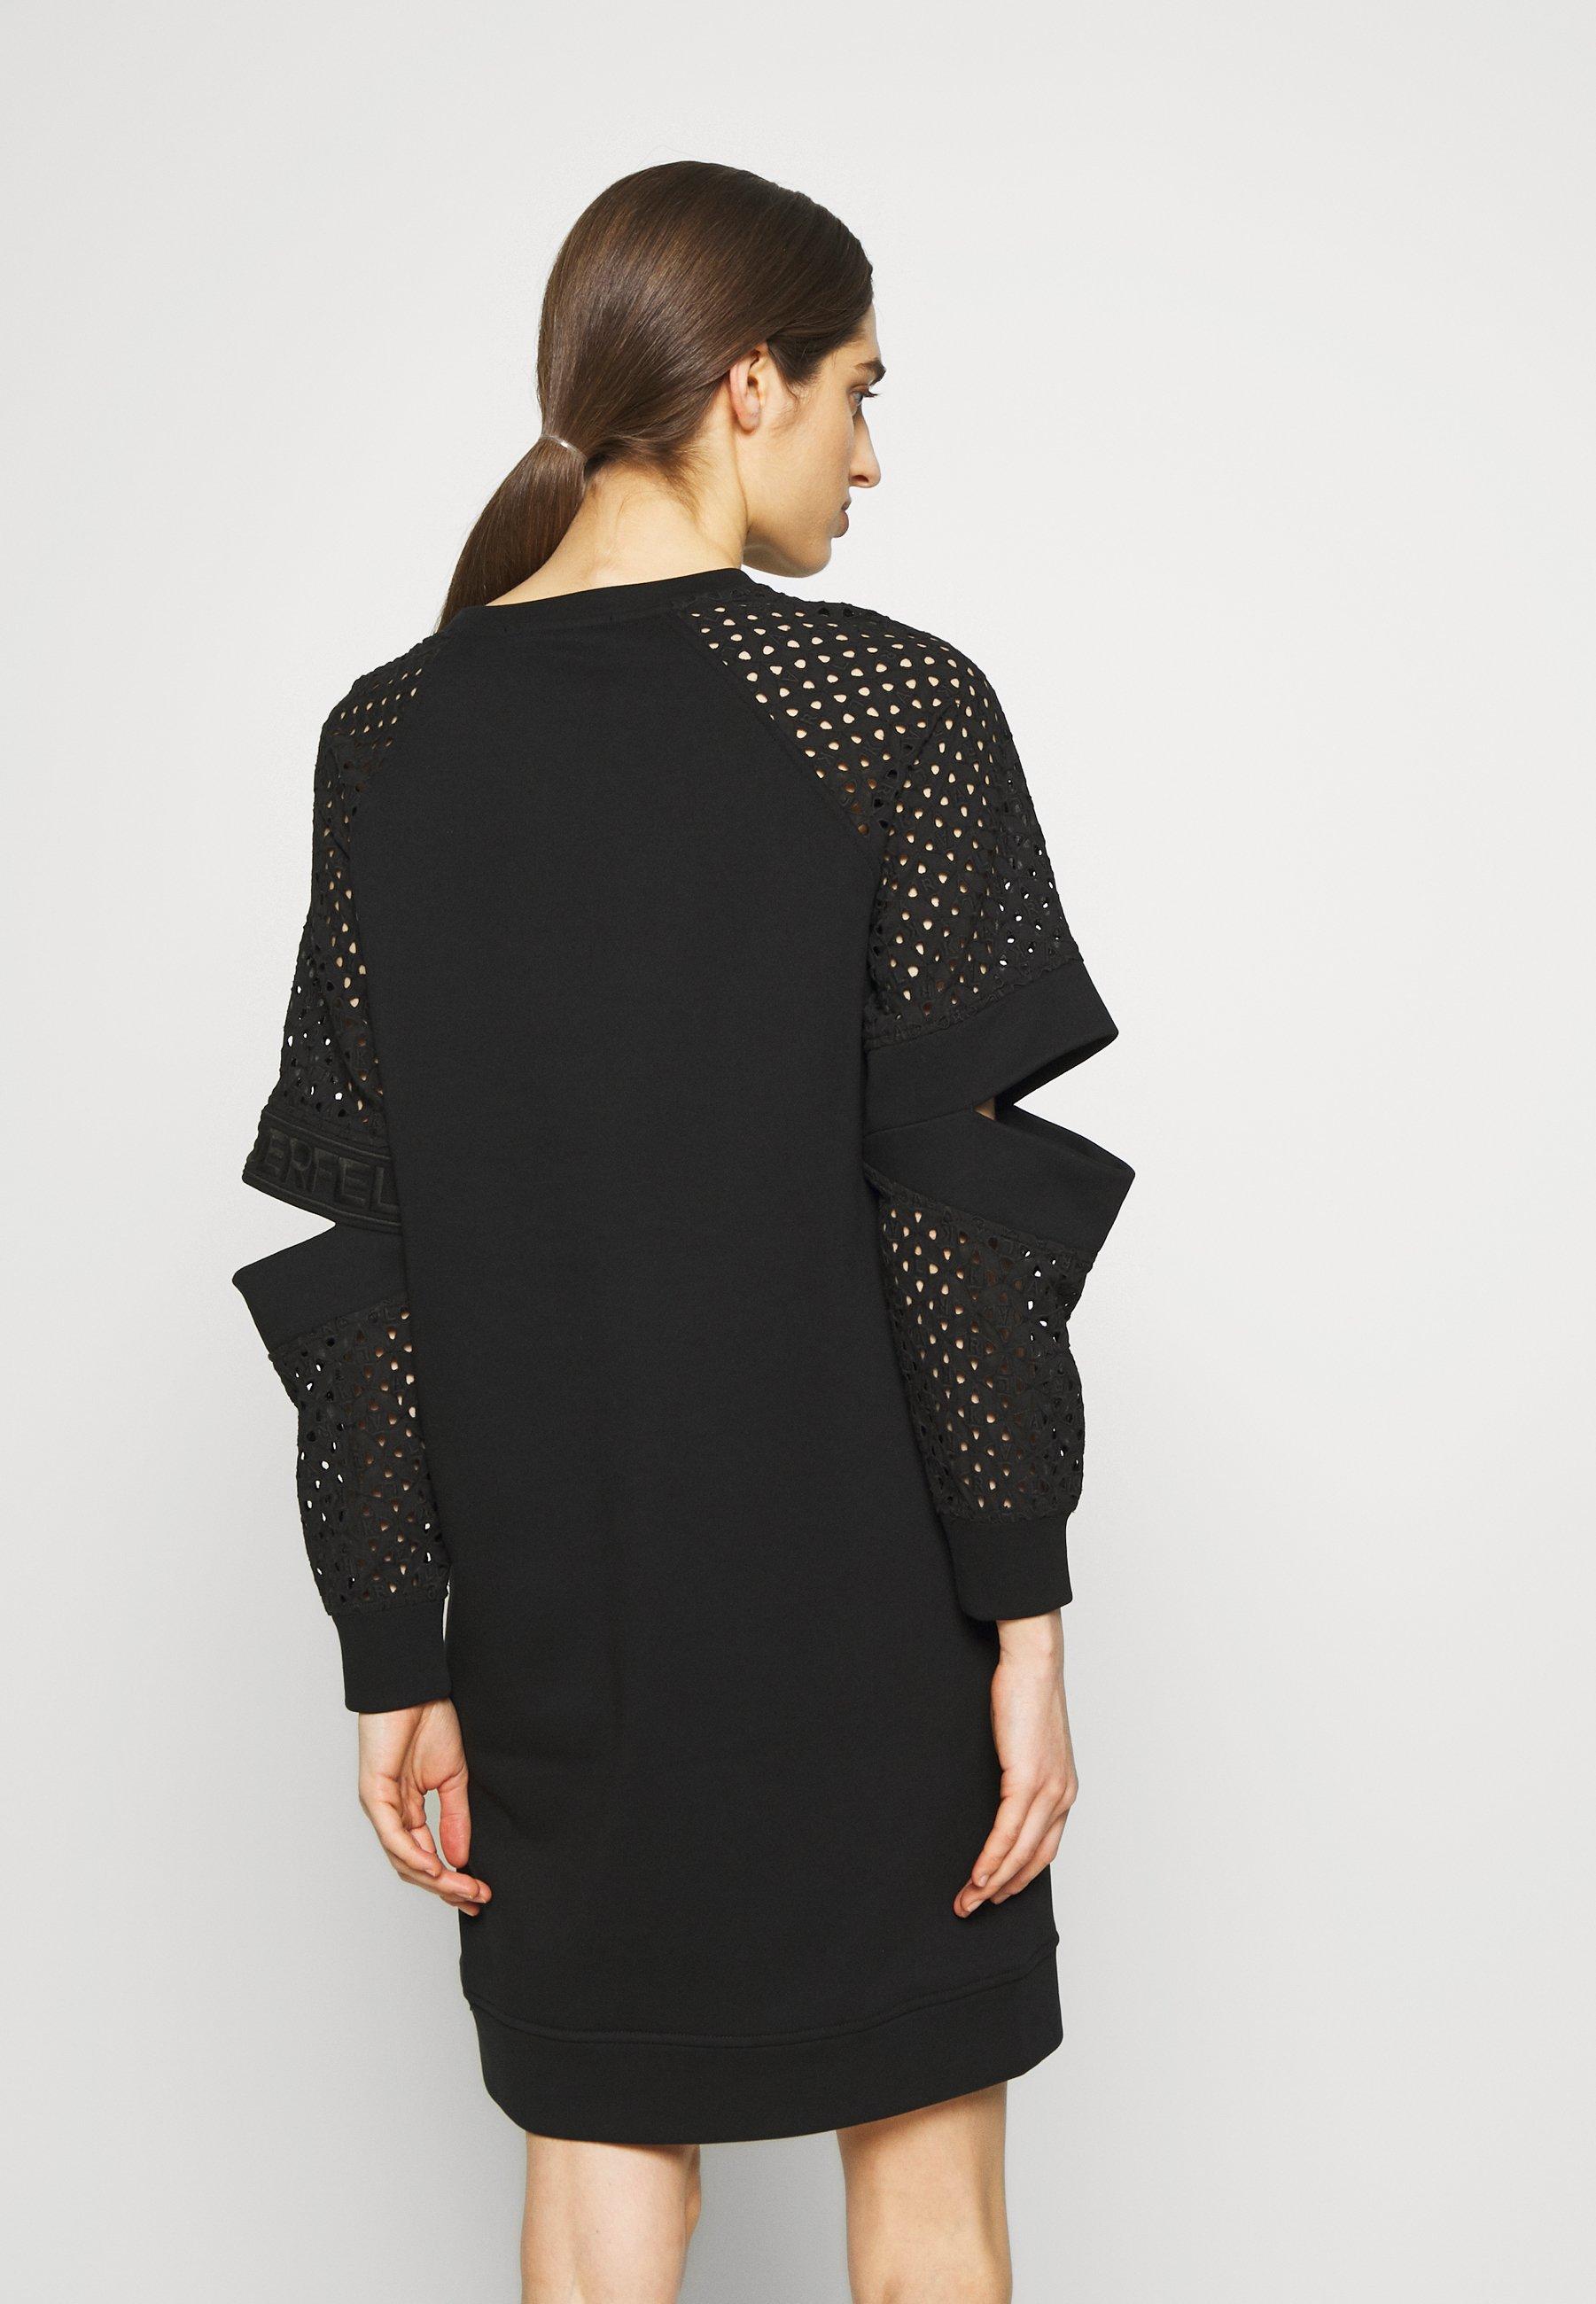 Karl Lagerfeld Cut Out Dress - Vardagsklänning Black